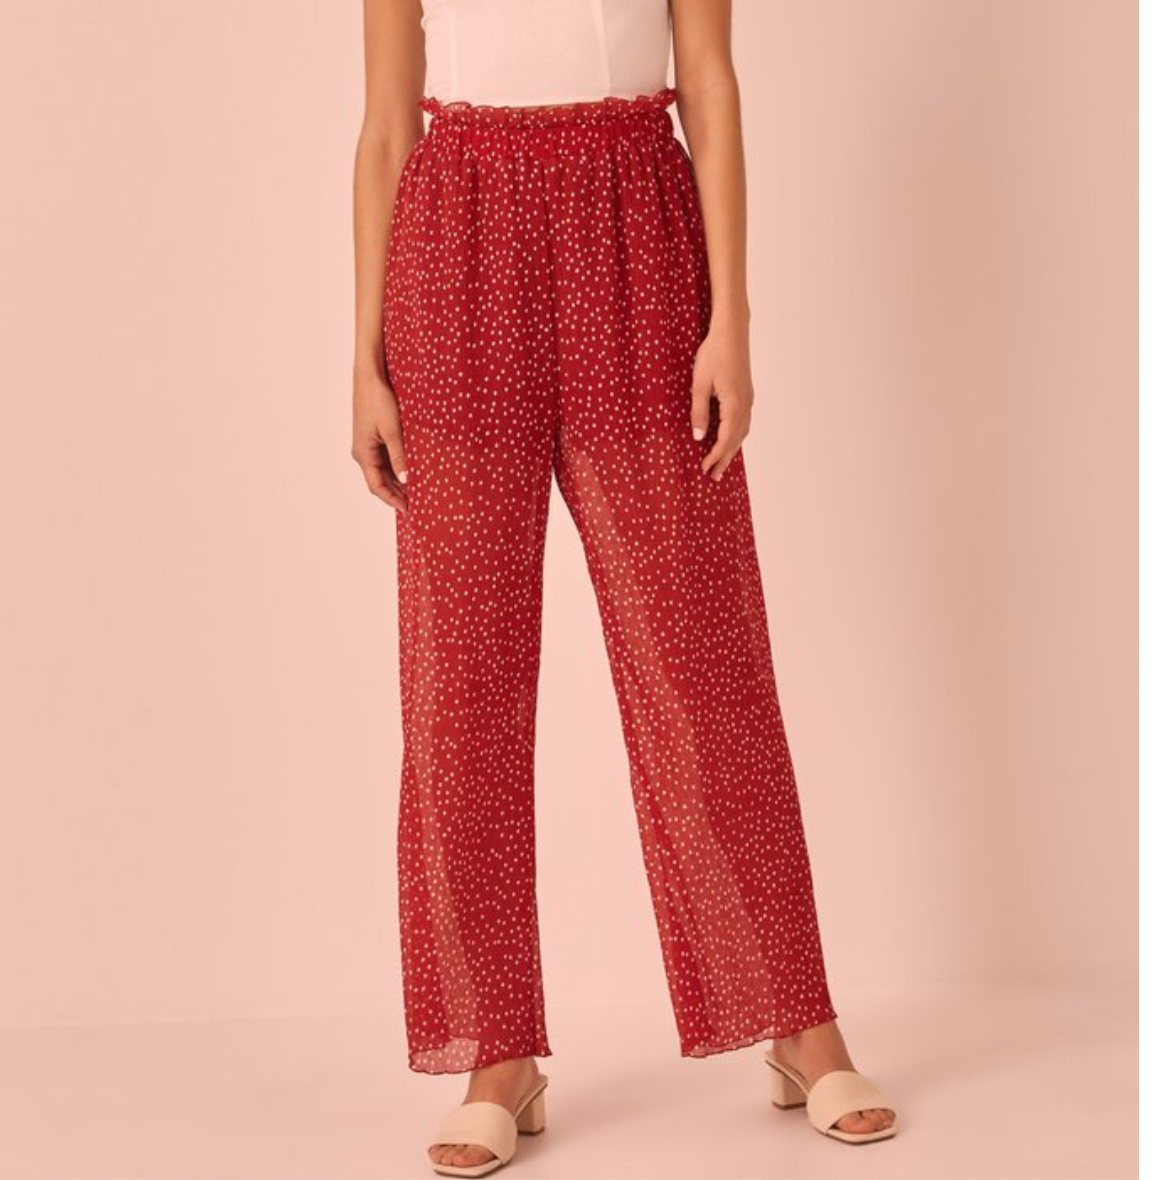 Red & White Polka Dot Plisse Pants